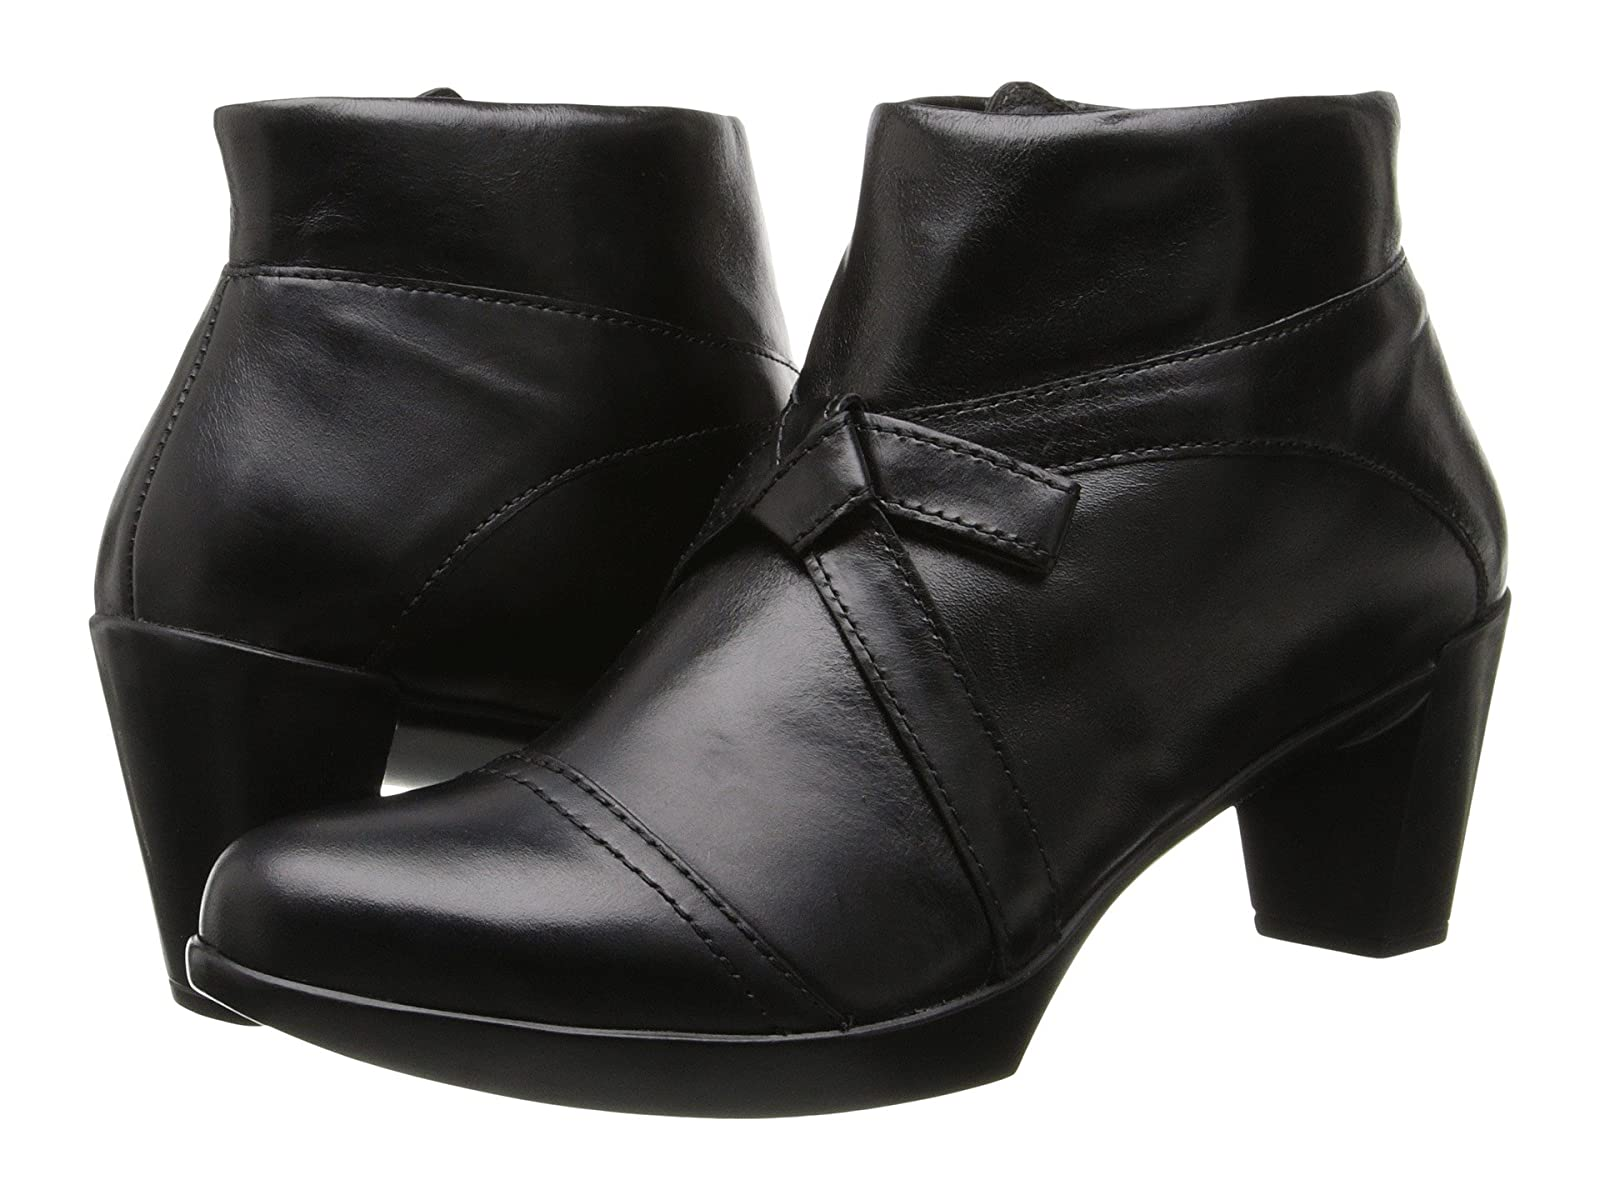 Naot VistosoCheap and distinctive eye-catching shoes